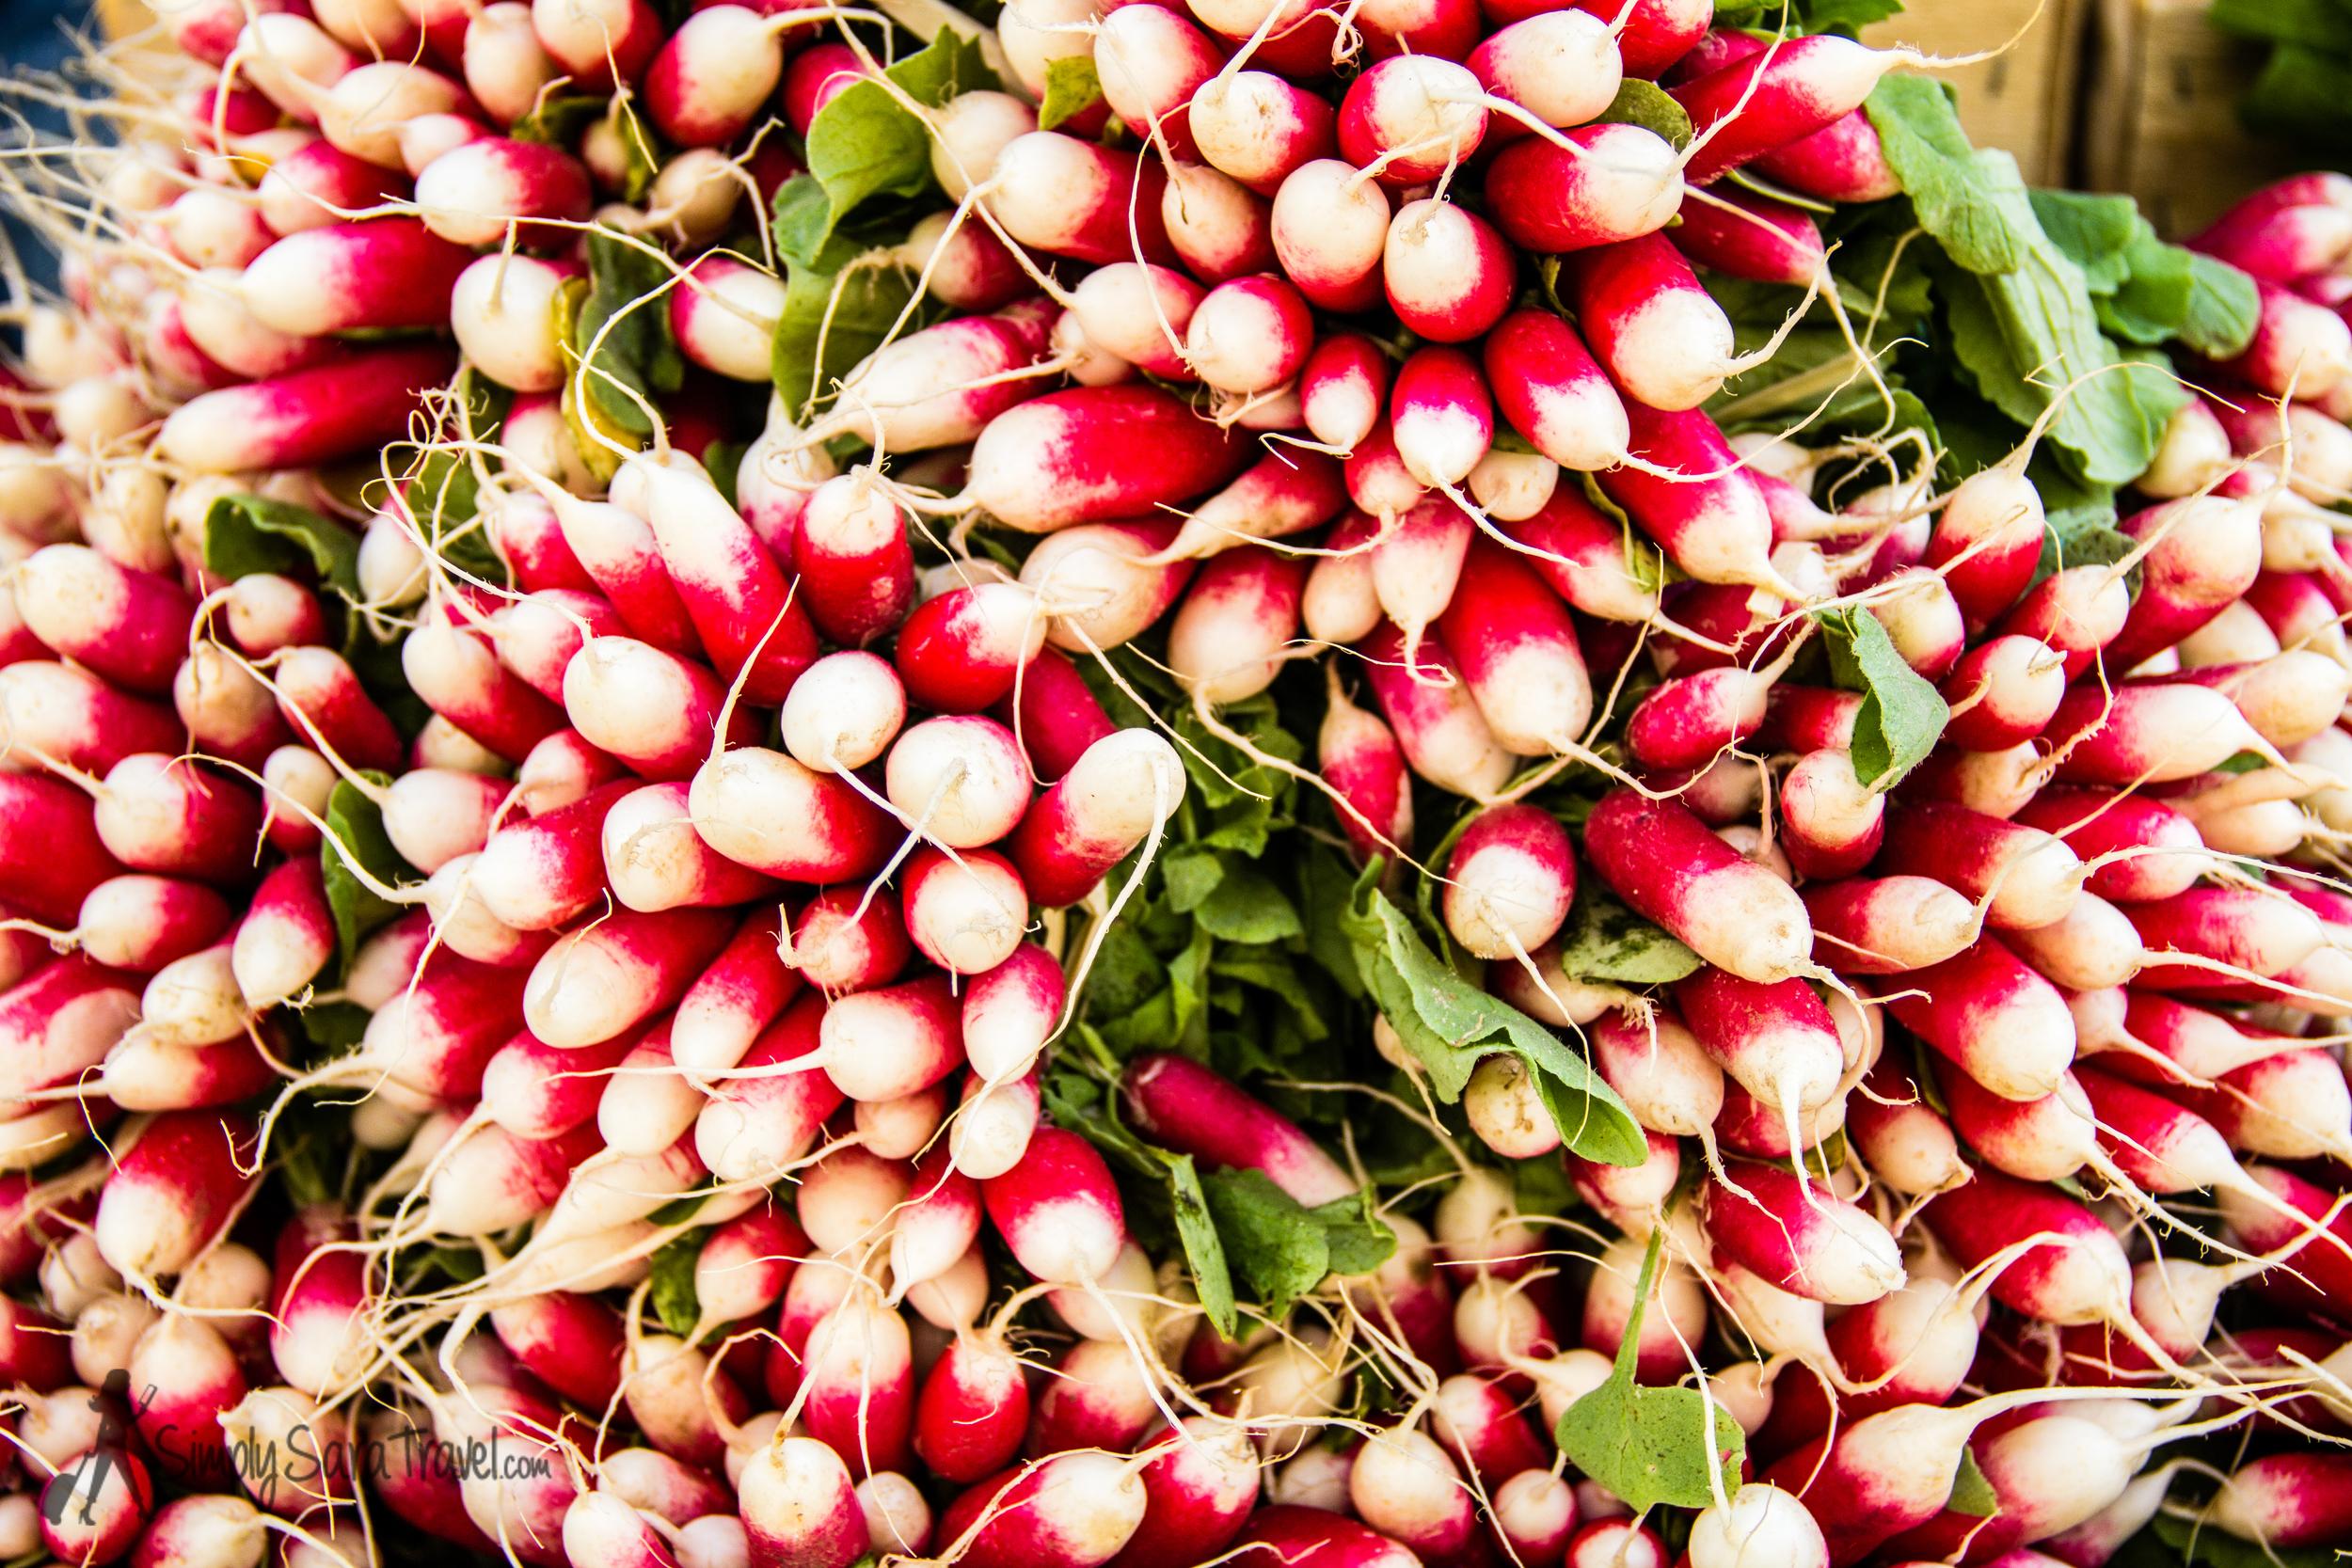 Radishes atMarché aux Légumes at PlaceBillard